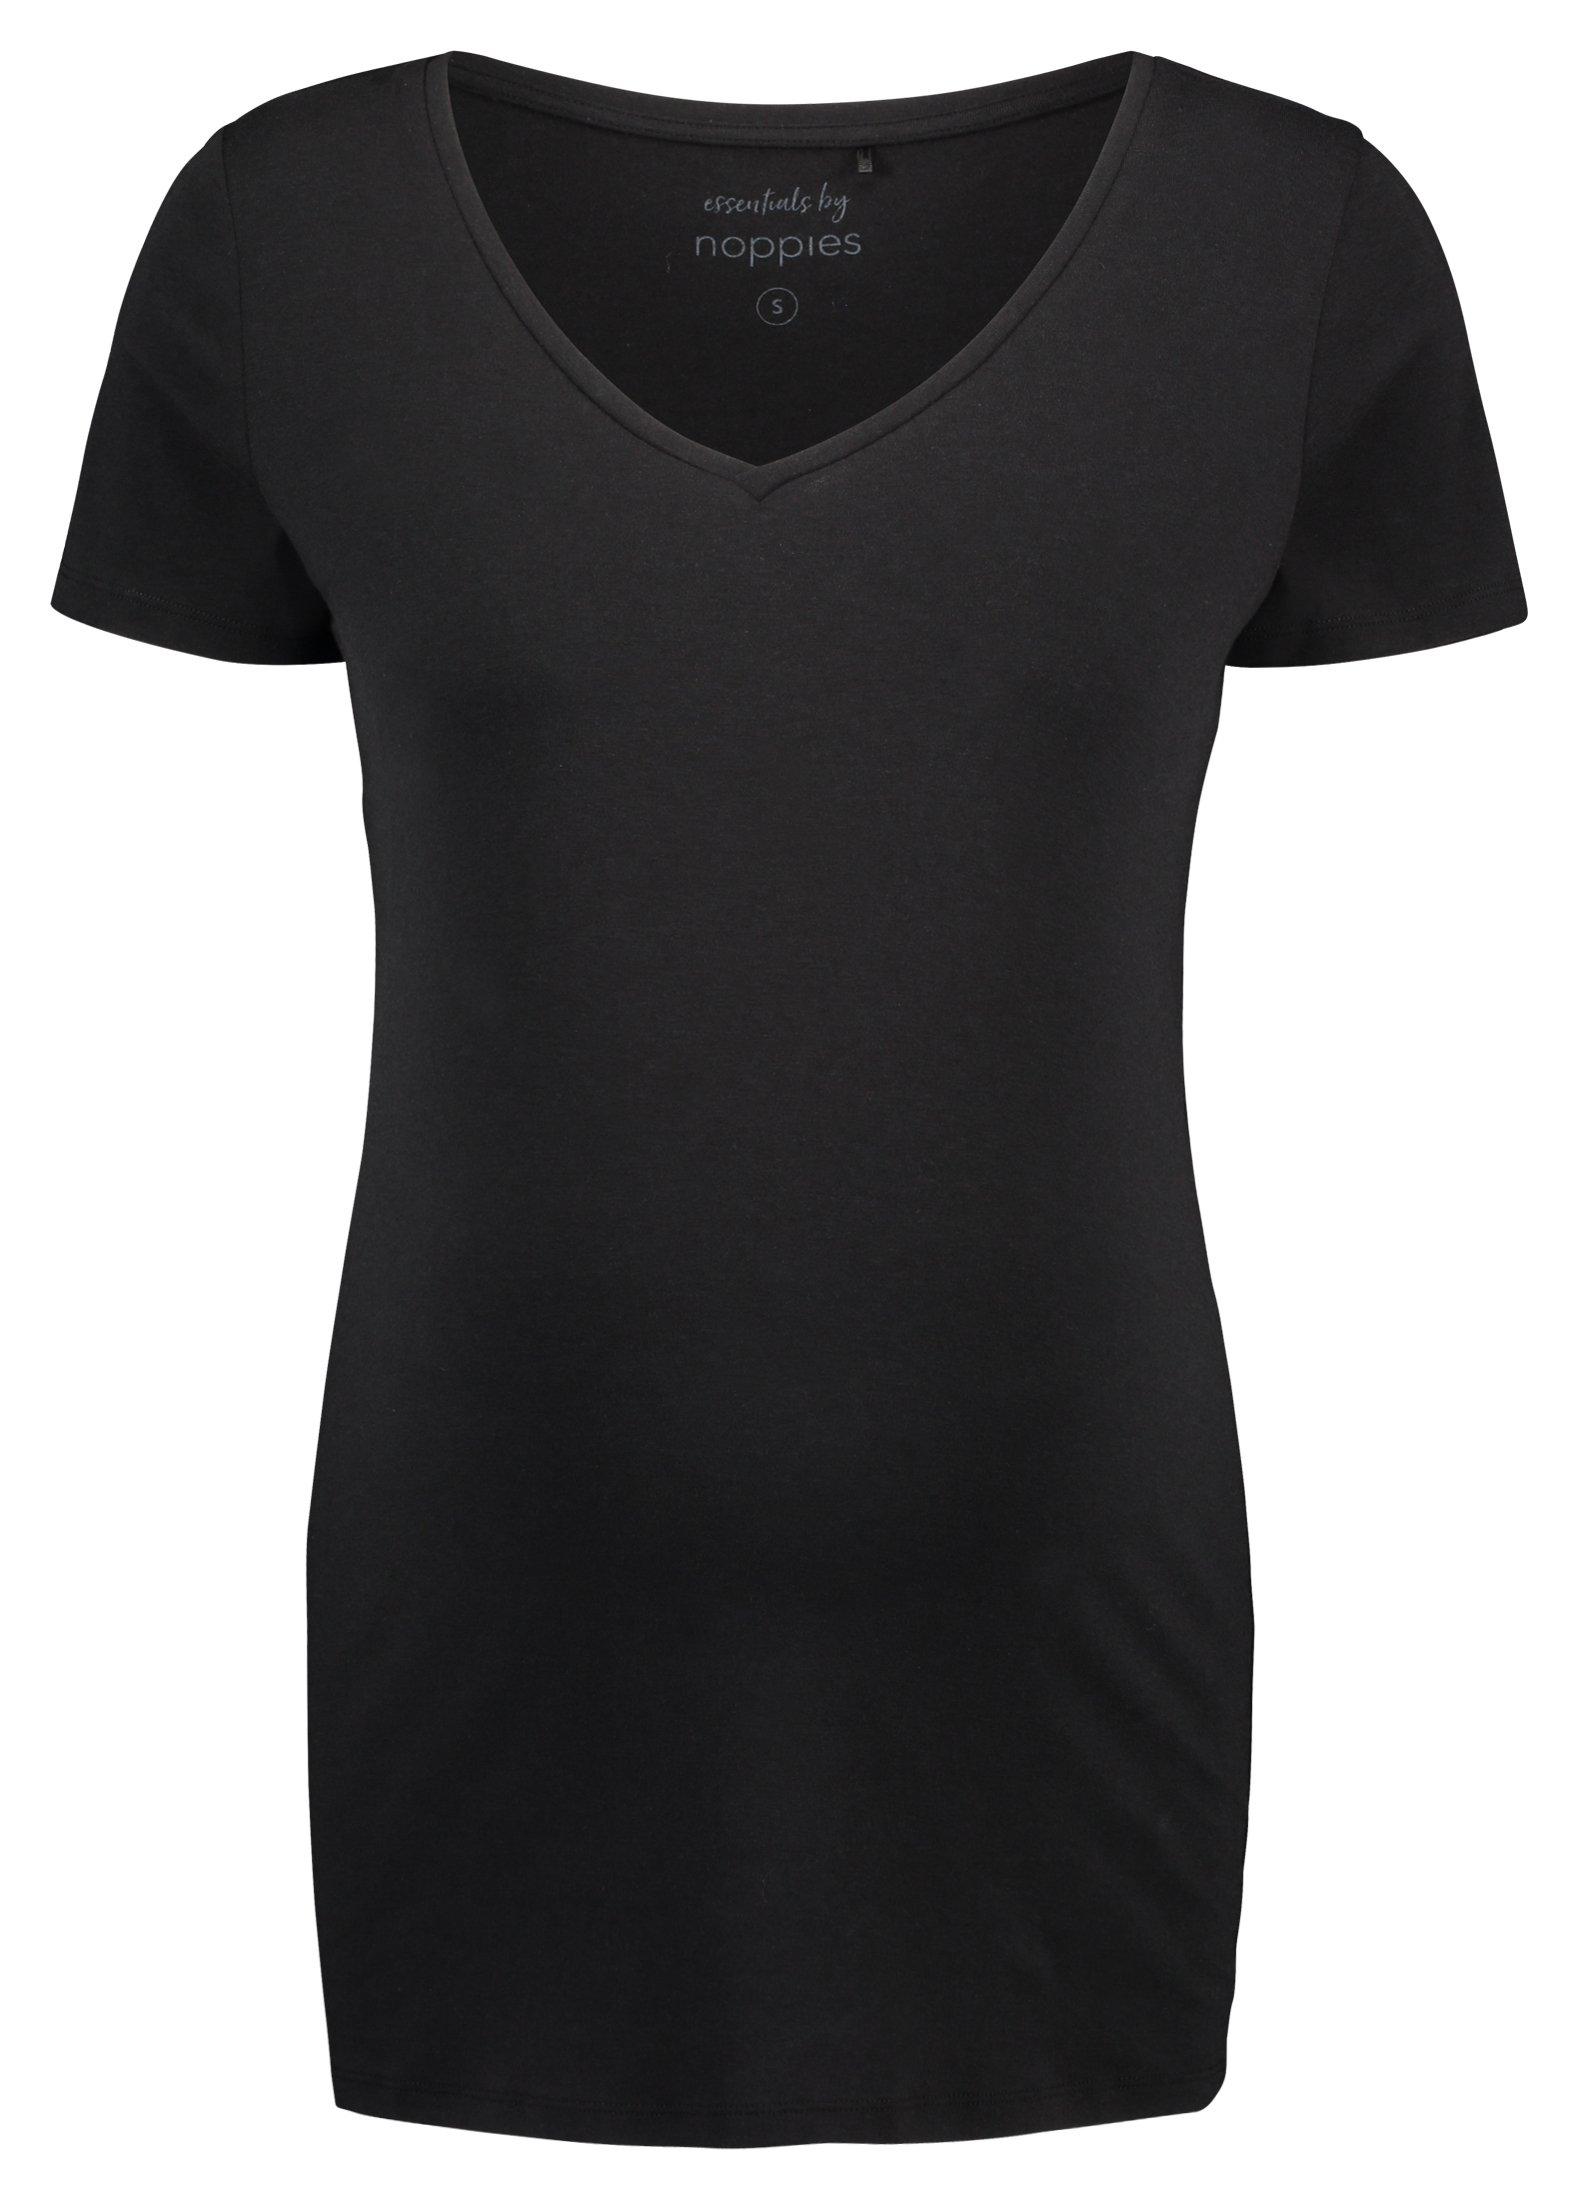 Noppies T-shirt »Rome« nu online bestellen